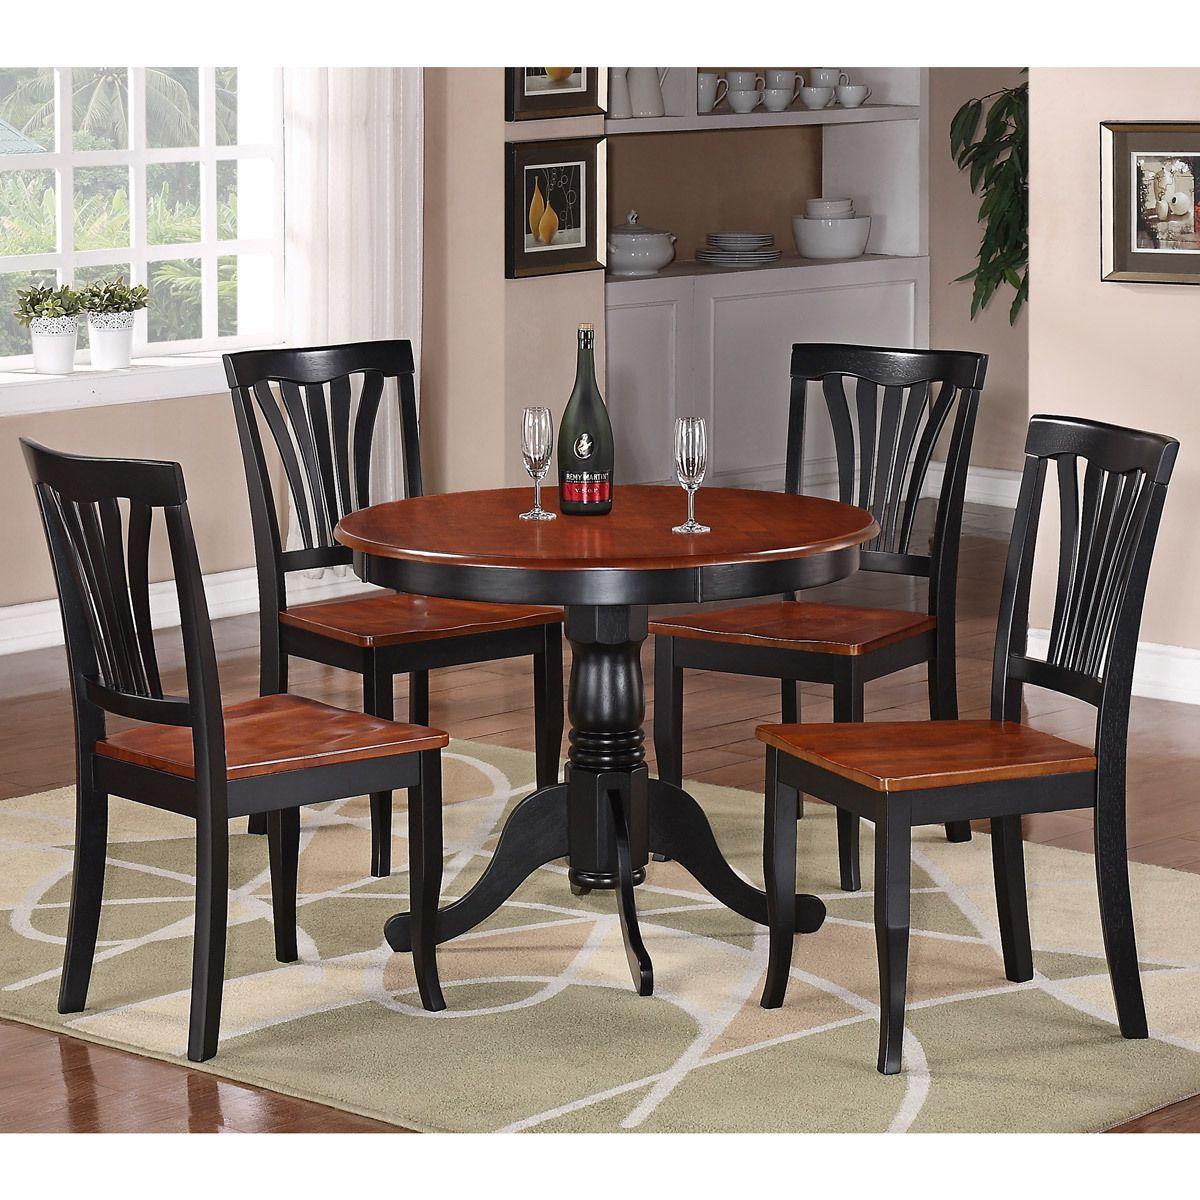 Our Best Dining Room Bar Furniture Deals Kitchen Dinette Sets Round Kitchen Table Set Wooden Kitchen Table